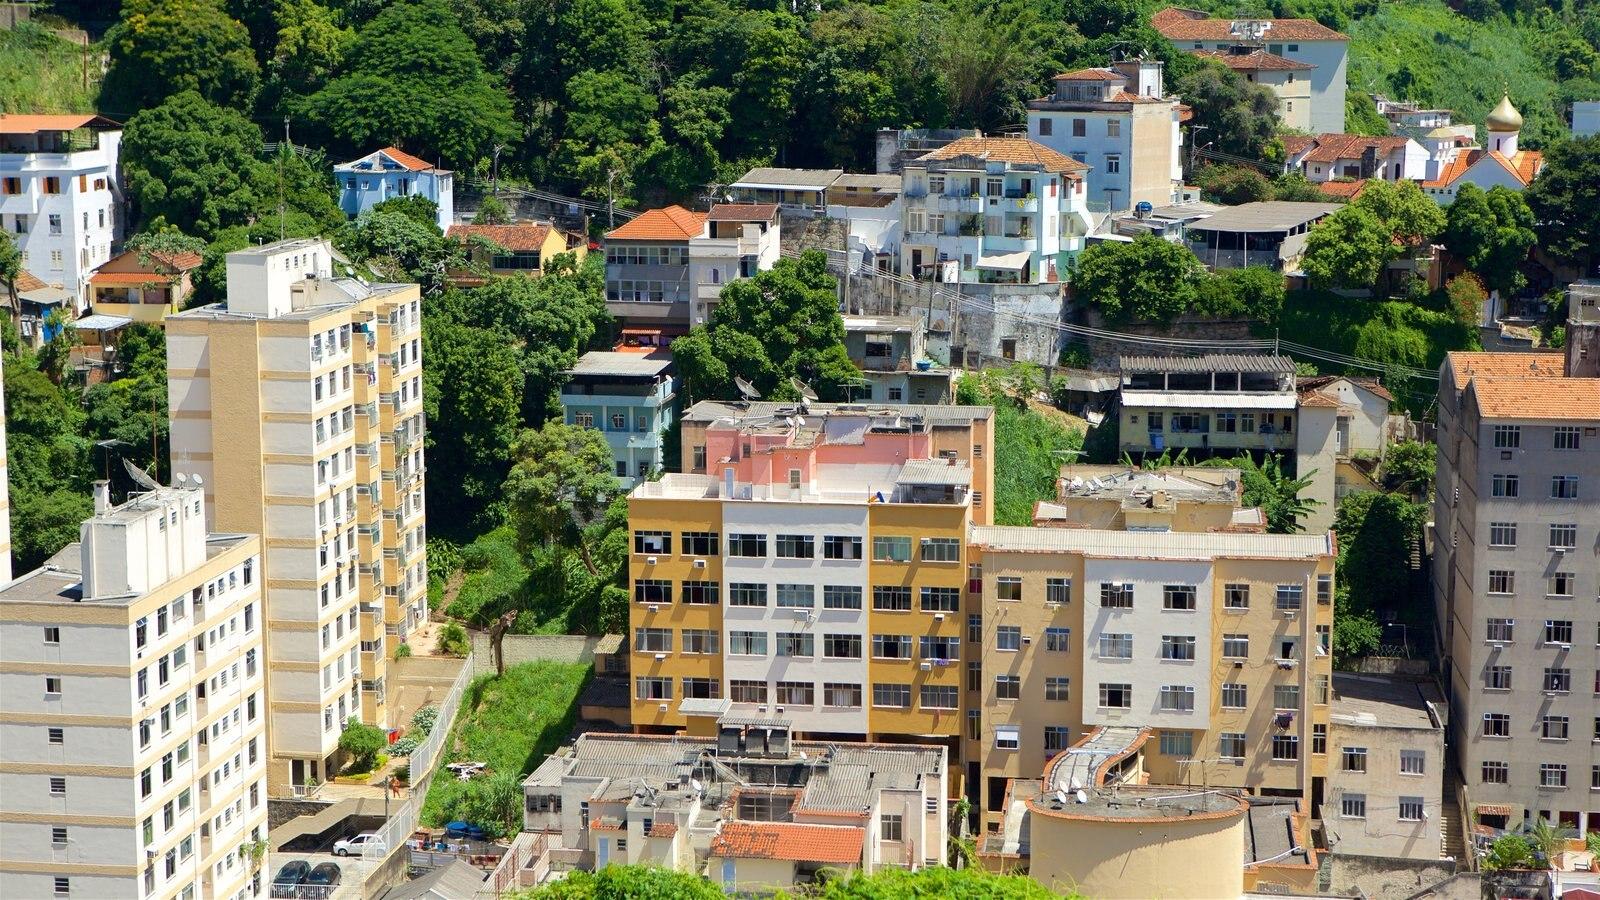 Santa Teresa caracterizando uma cidade